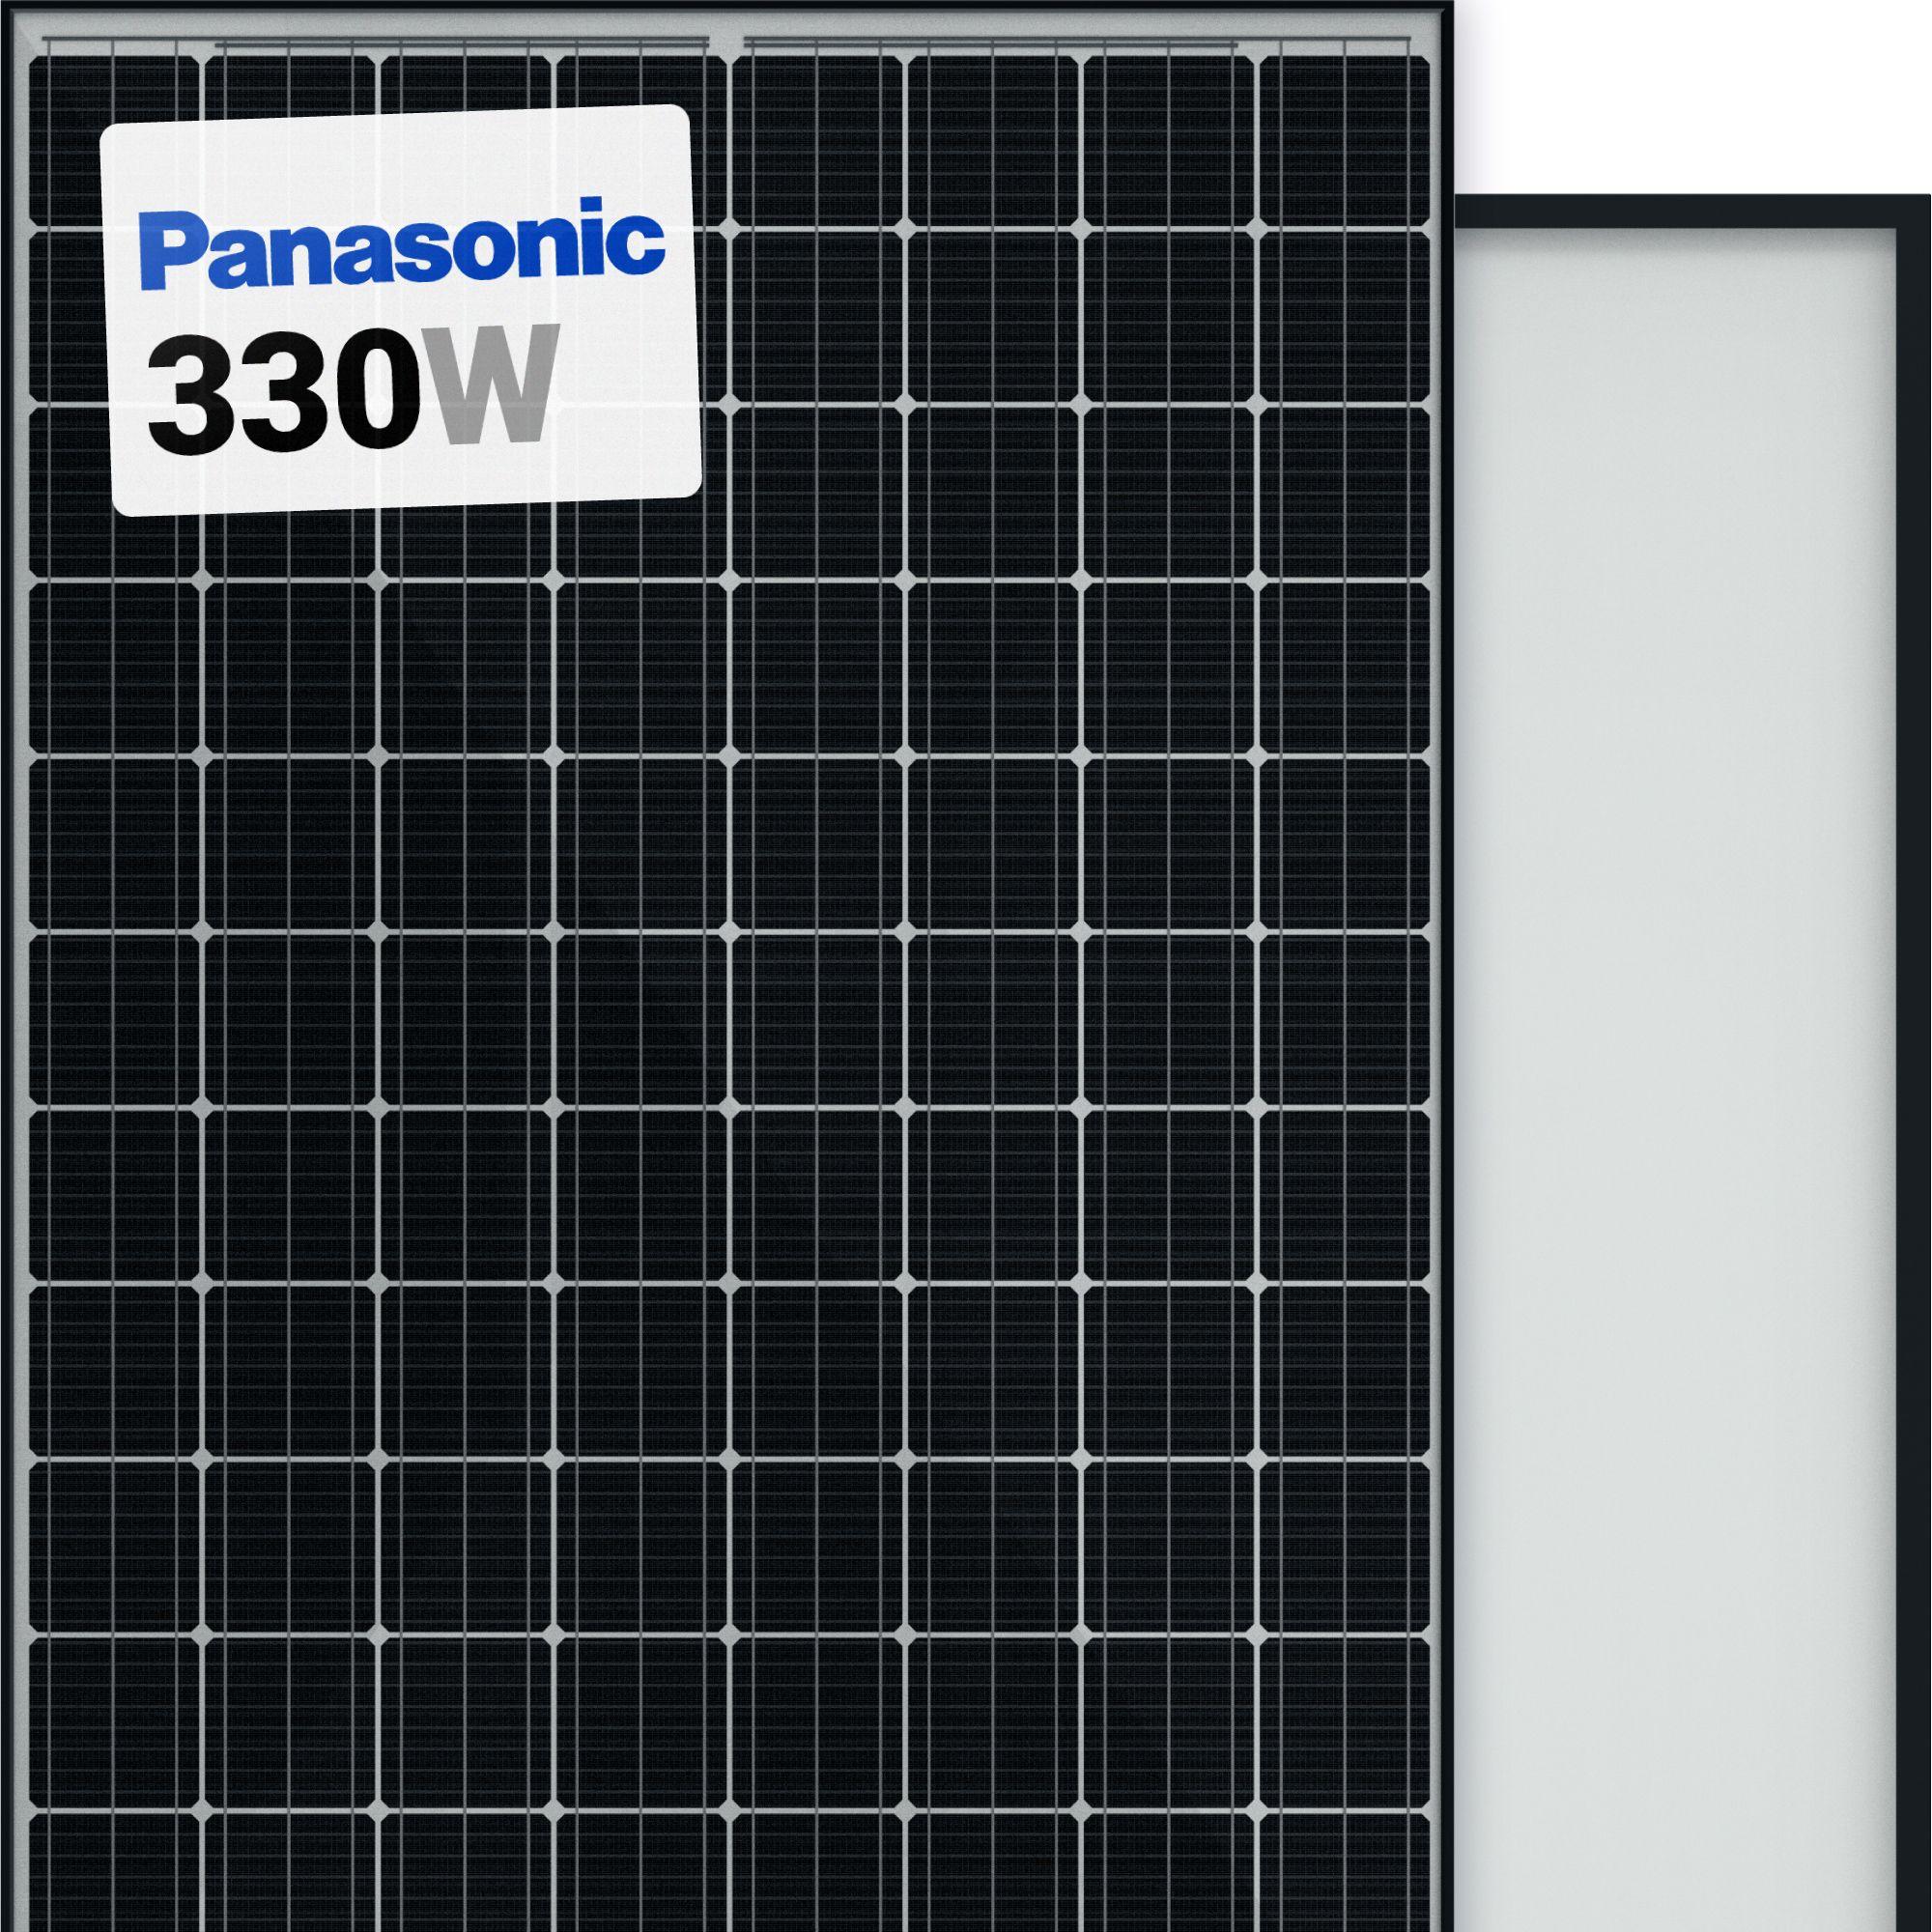 Panasonic Hit 330w Solar Panel 96 Cell Vbhn330sa17 Monocrystalline Black A1 Solar Store In 2020 Solar Panels Solar Panels For Home Water Drainage System